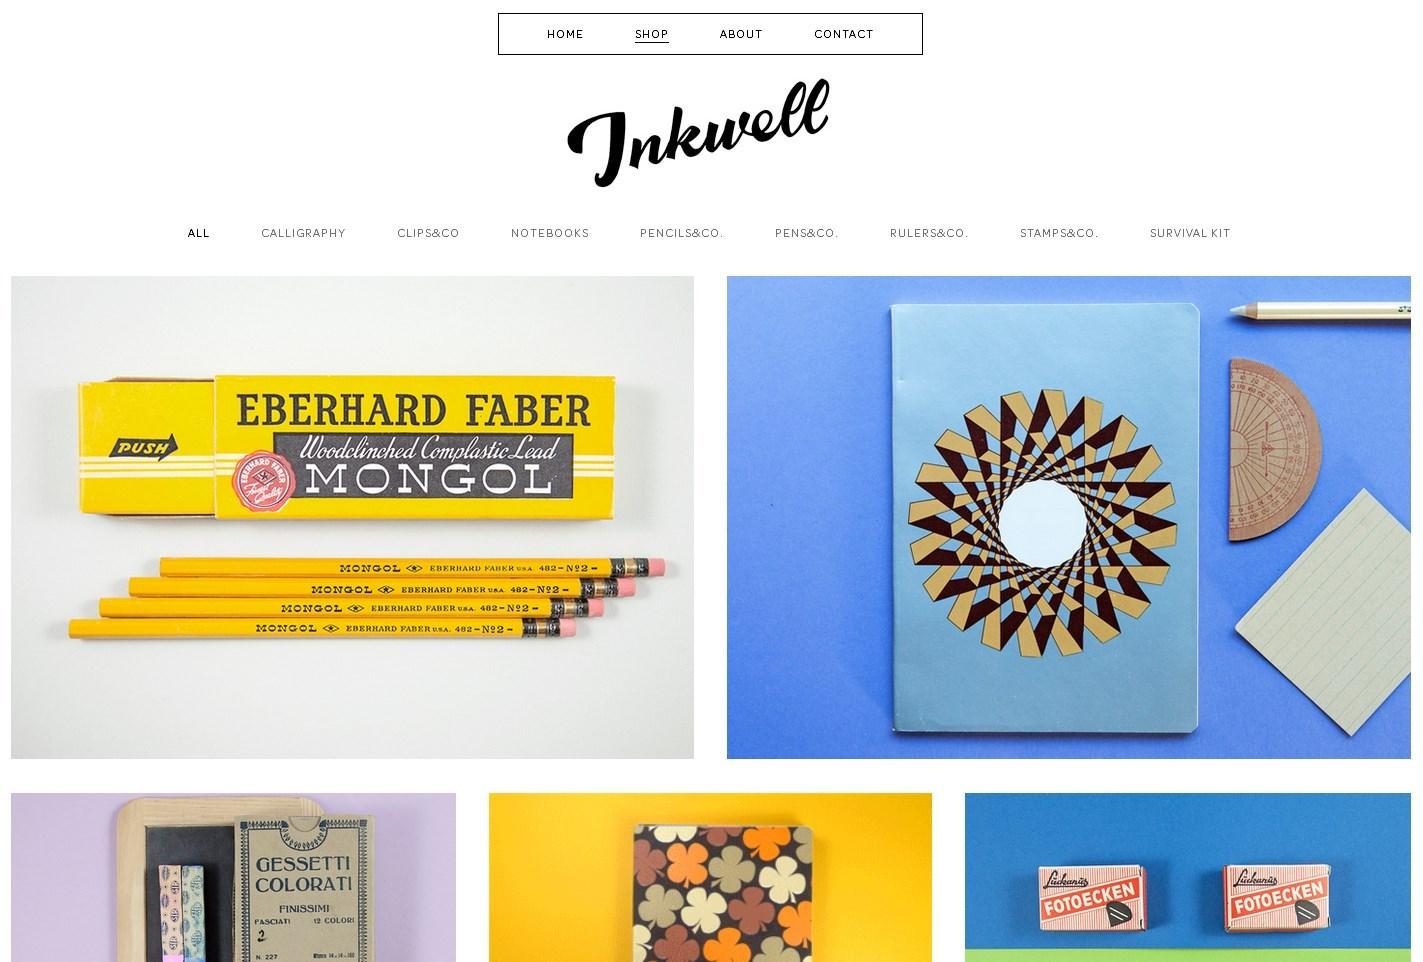 【Berlin/Inkwell】ベルリンを訪れたら行きたい文具店、インクウェルさんからメールいただきました。